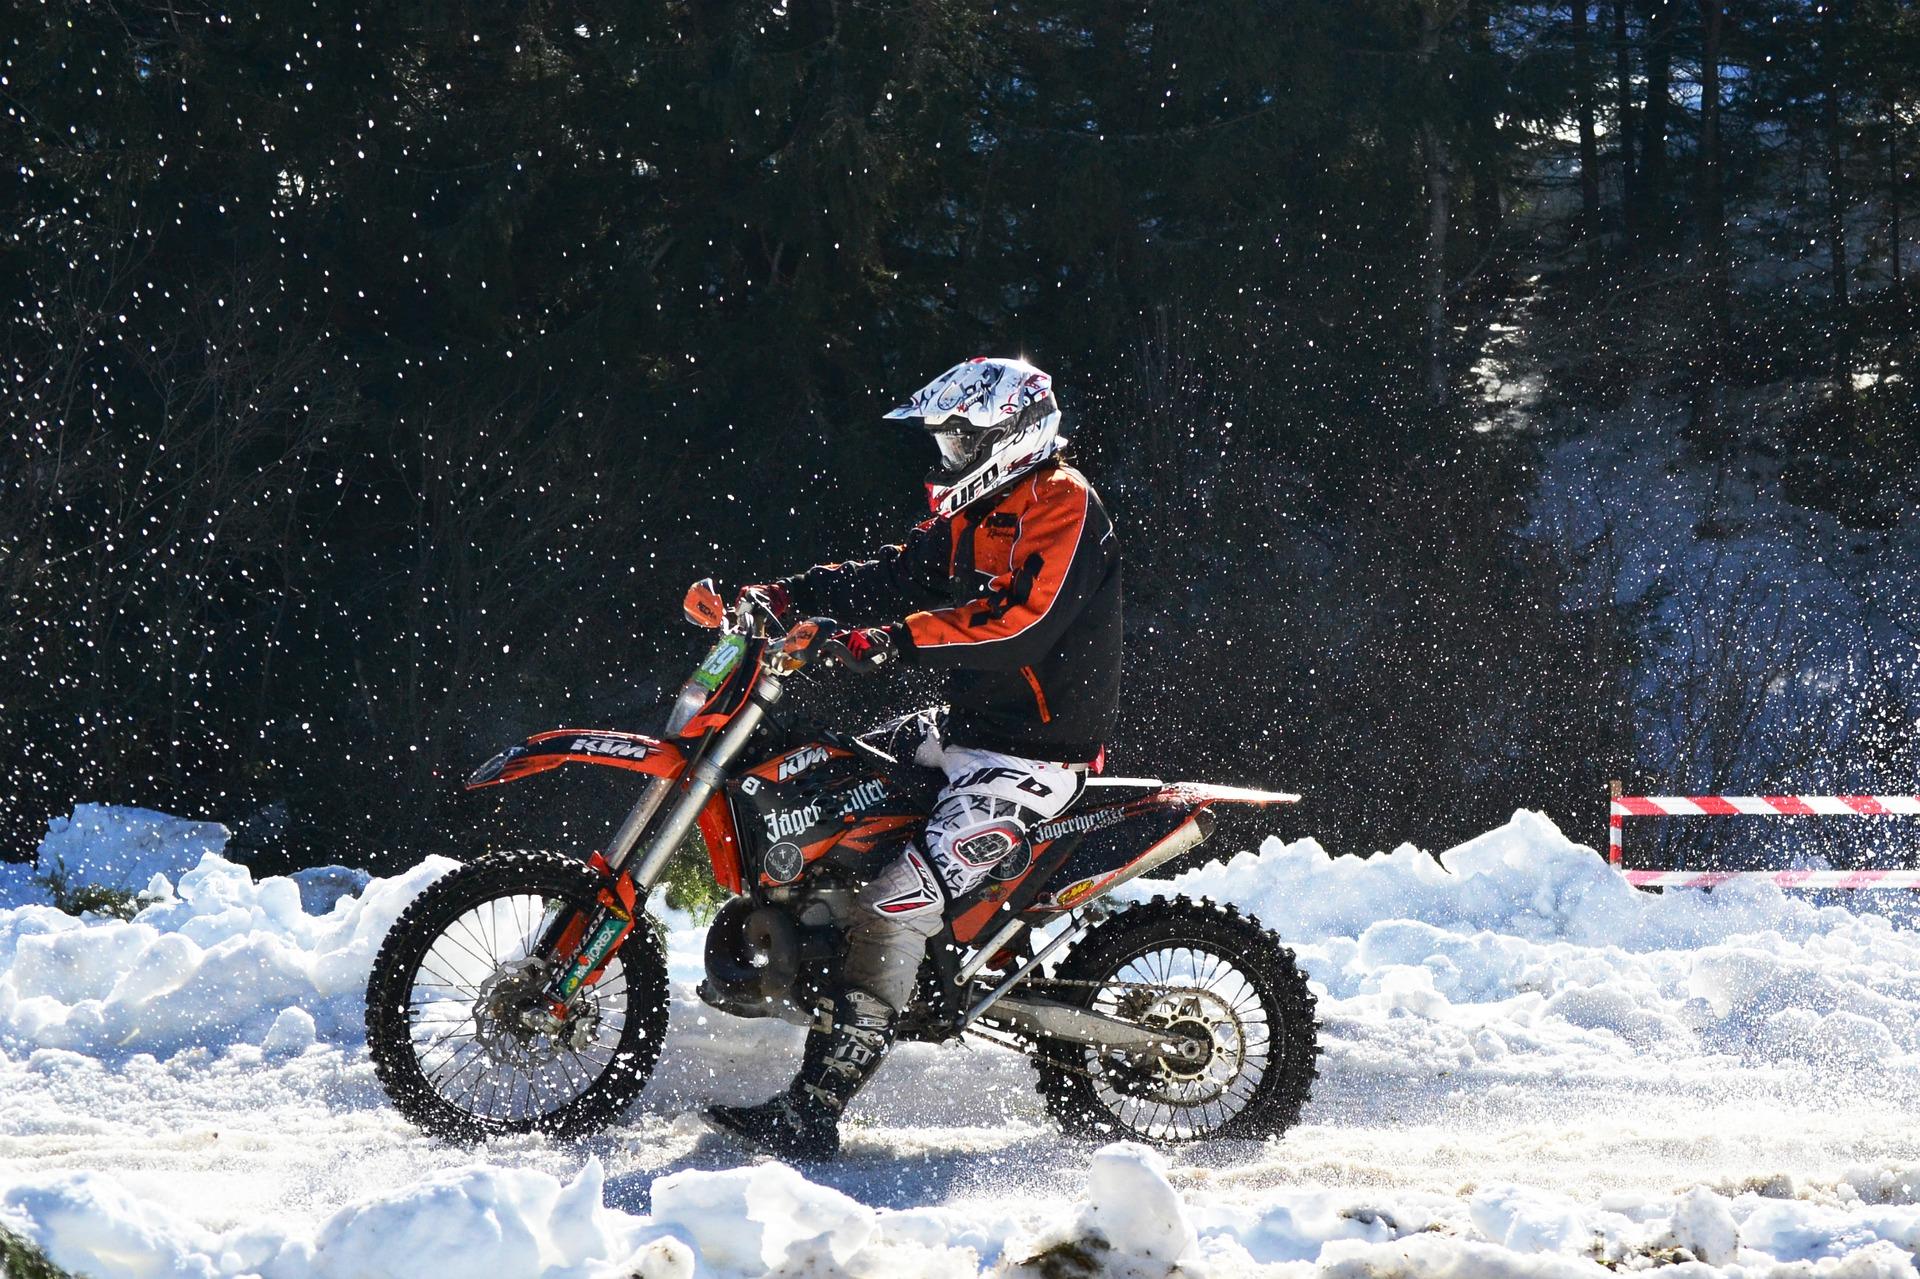 Motorrad Winterhandschuhe Test